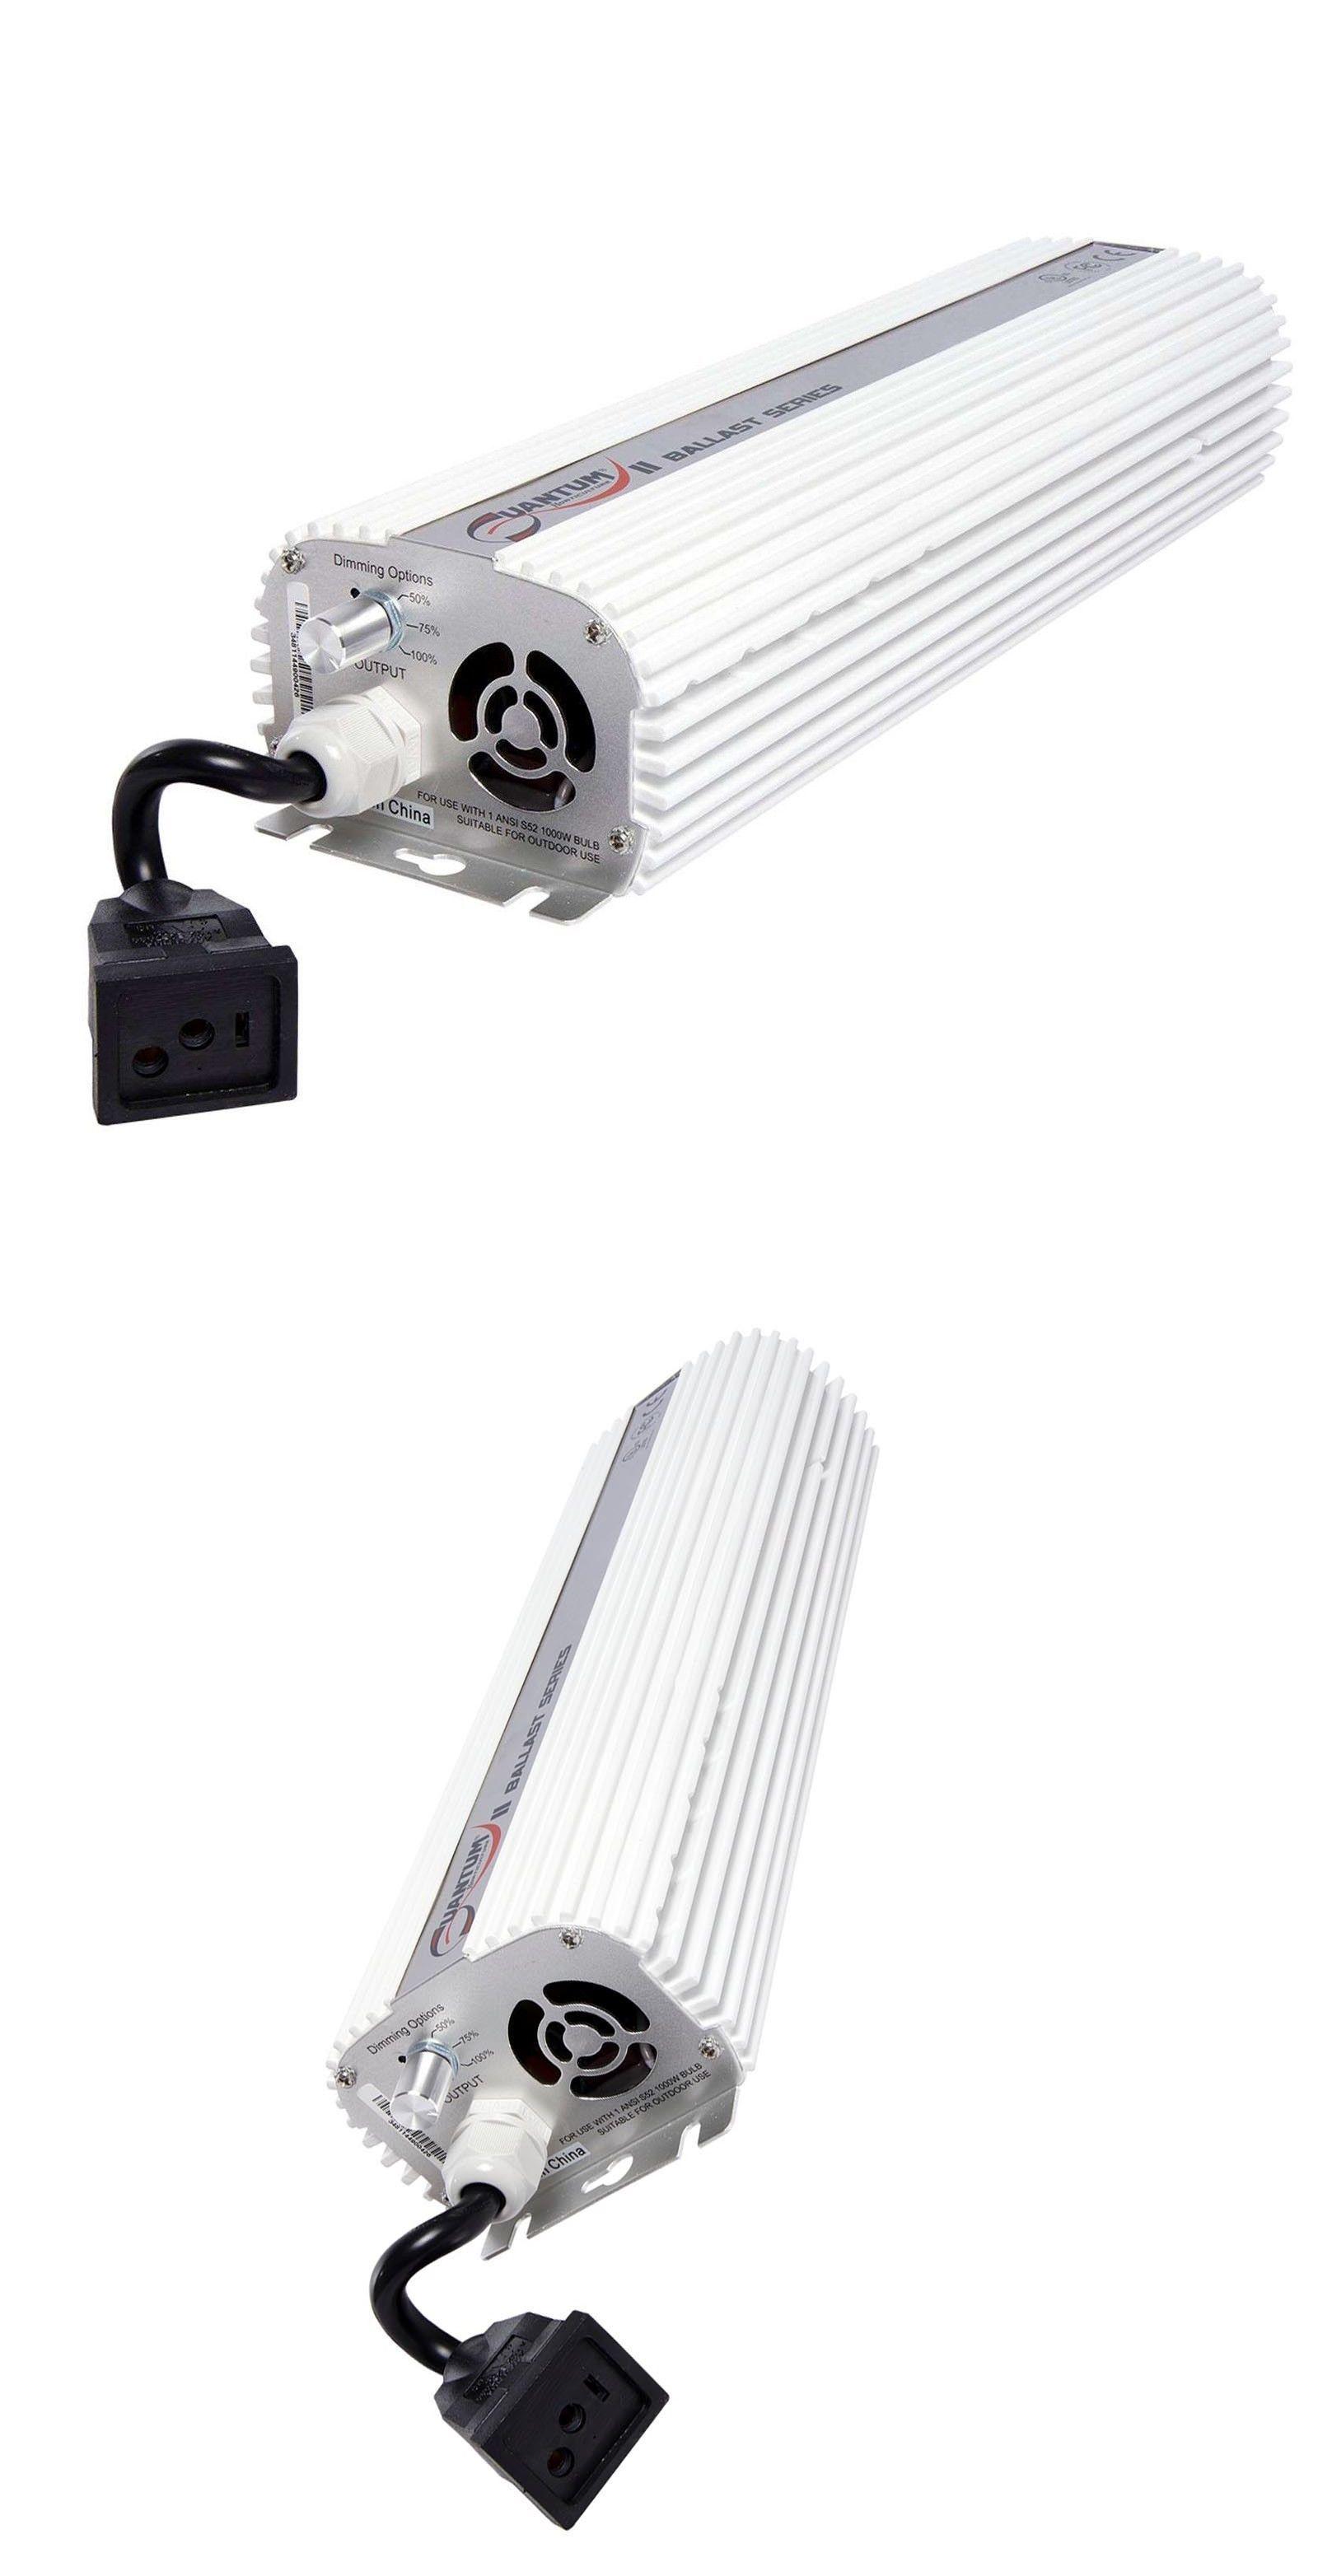 Grow Light Ballasts 179016 Quantum 1000w Watt Hps Mh Dimmable Digital Grow Light Lamp Ballast Qt1000 Hydro Buy It Now Only Lamp Light Grow Lights Ballast